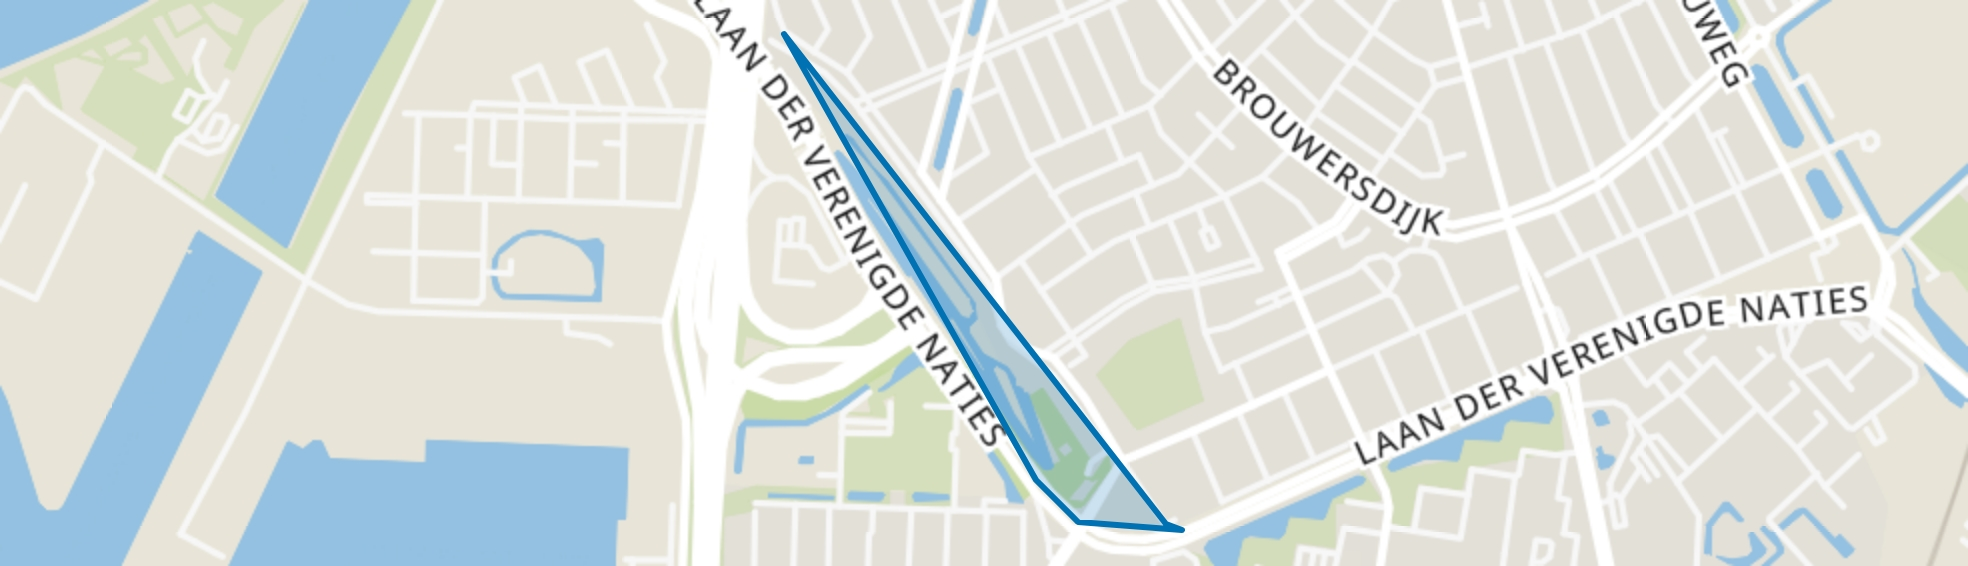 Zuidendijk, Dordrecht map